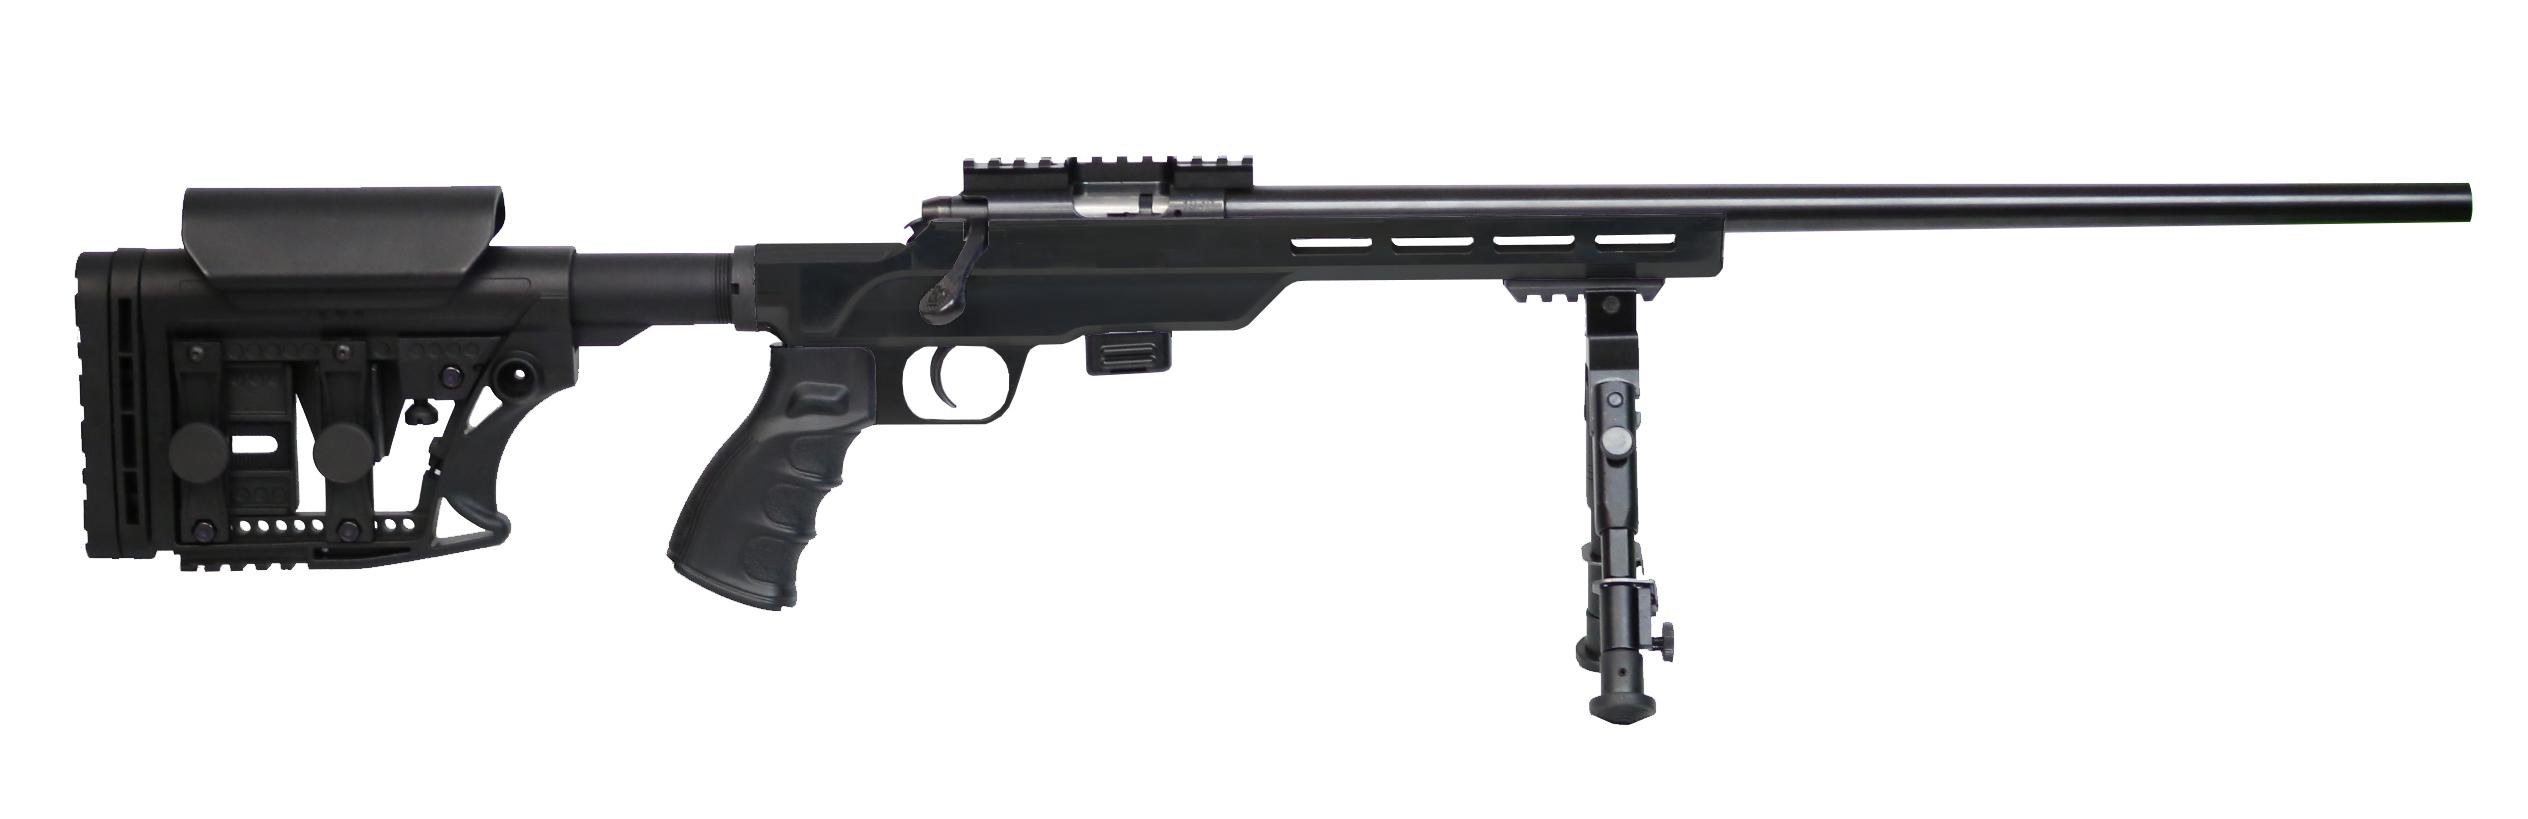 Keystone Sporting Arms 722 PRECISION TRAINER 22 LR